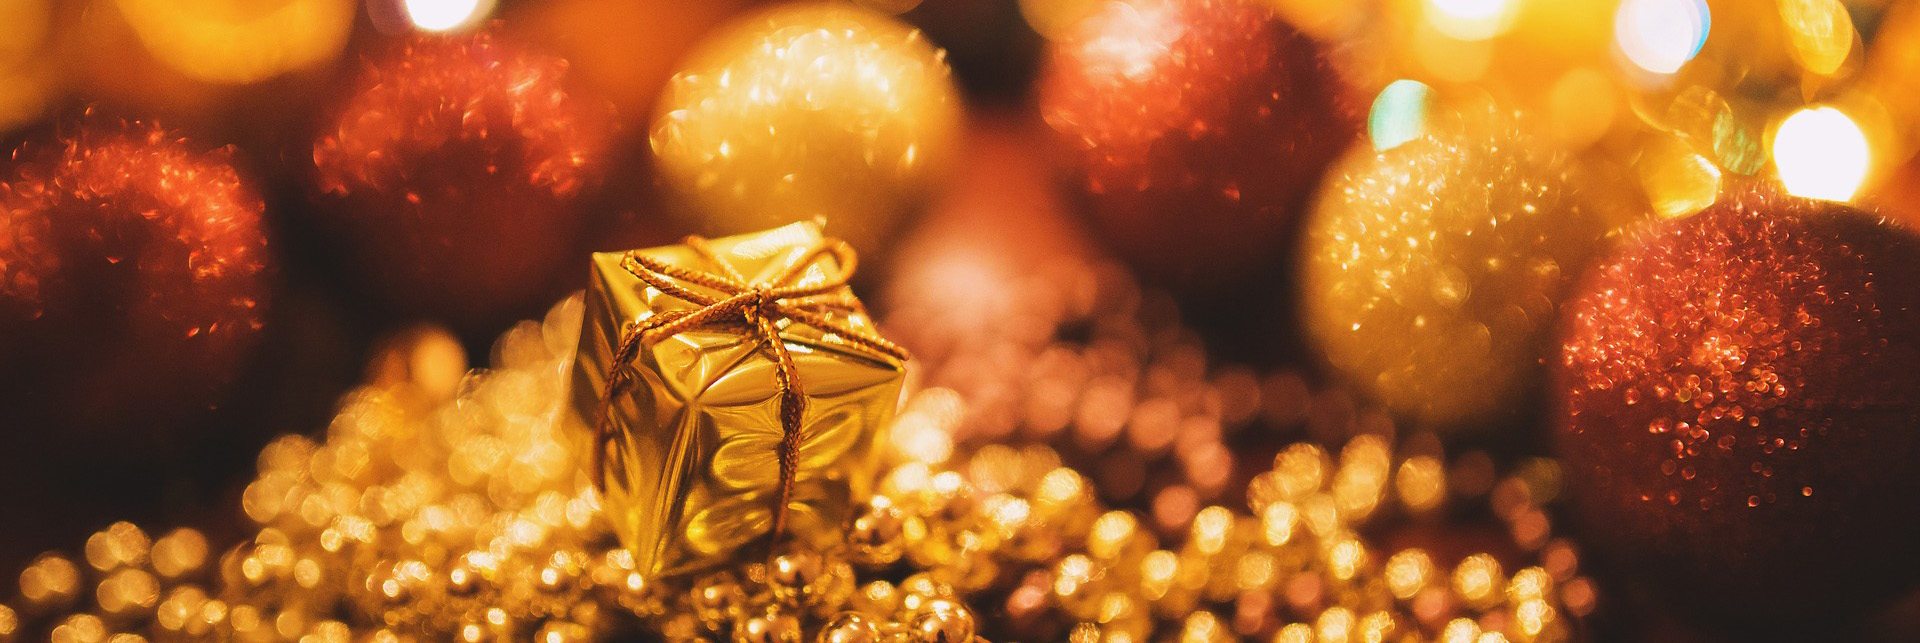 Santa's Sleigh 2015